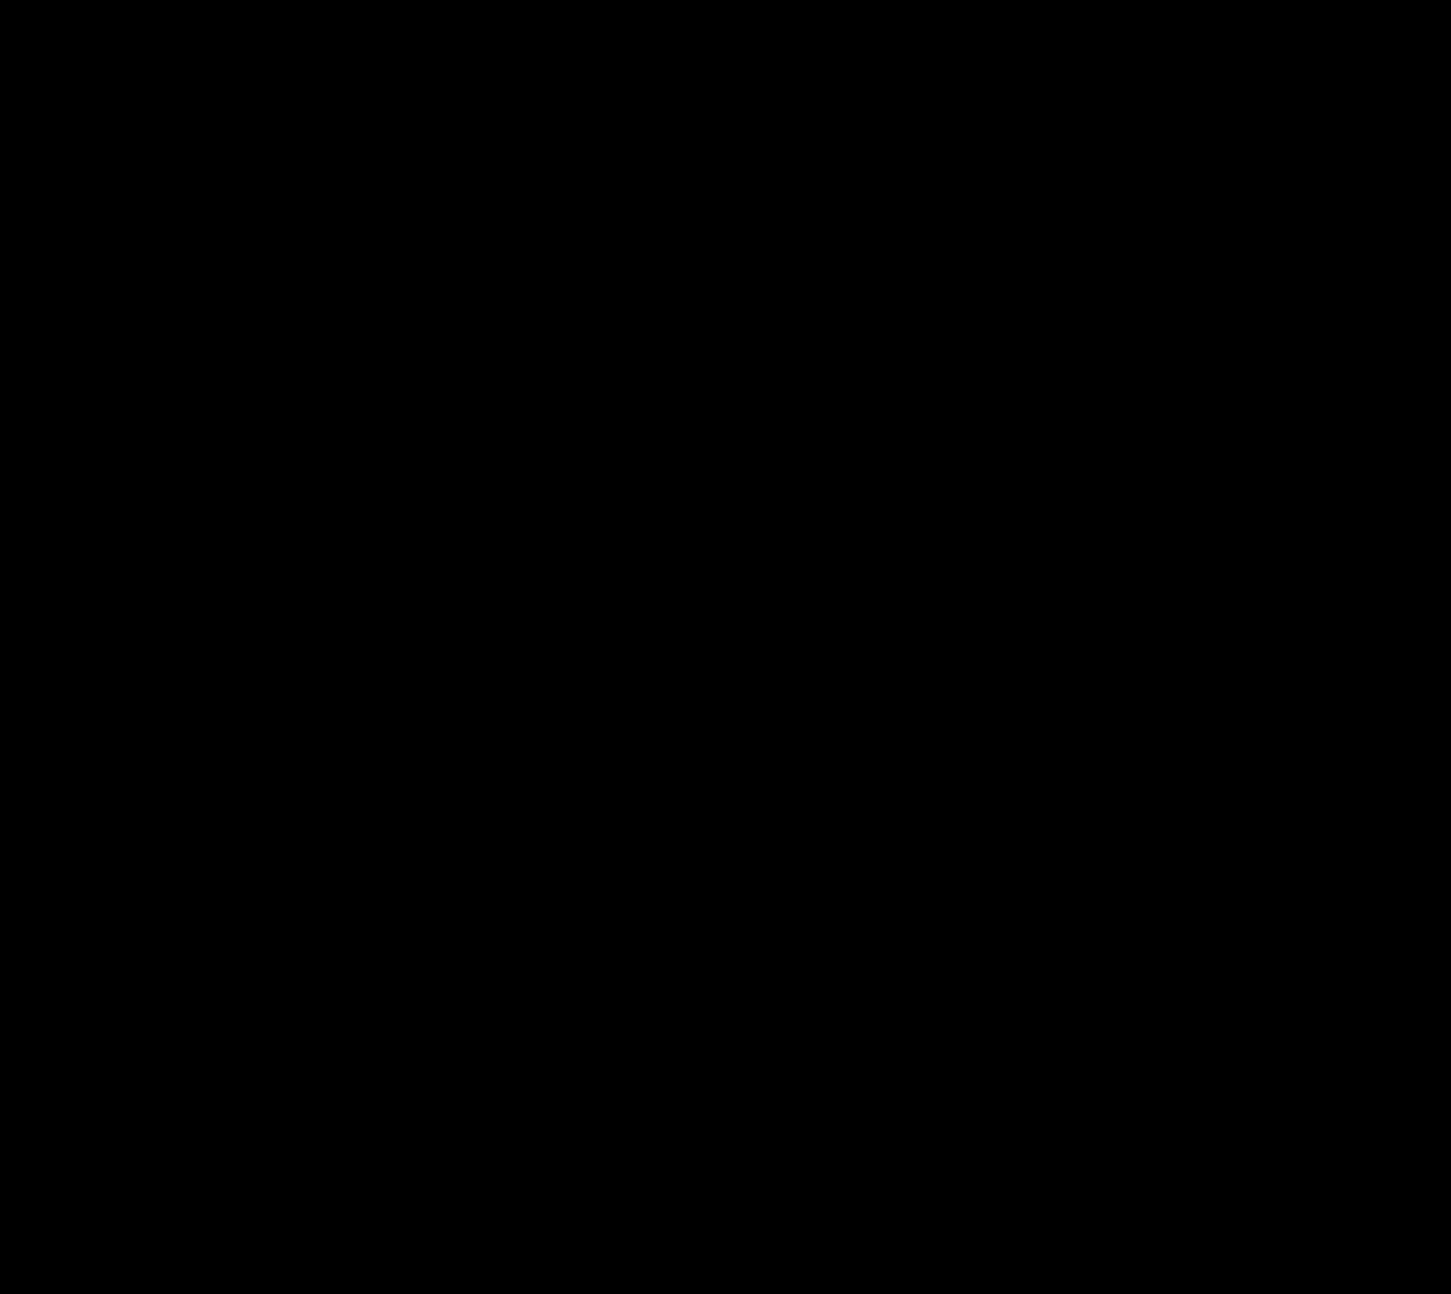 BEKATEQ BK-250EP 2K Vergussmasse Elektronik Gieß harz Elektro Vergussmasse | Elektrovergussmasse Elektronik vergieß en isolieren (625g, Schwarz)